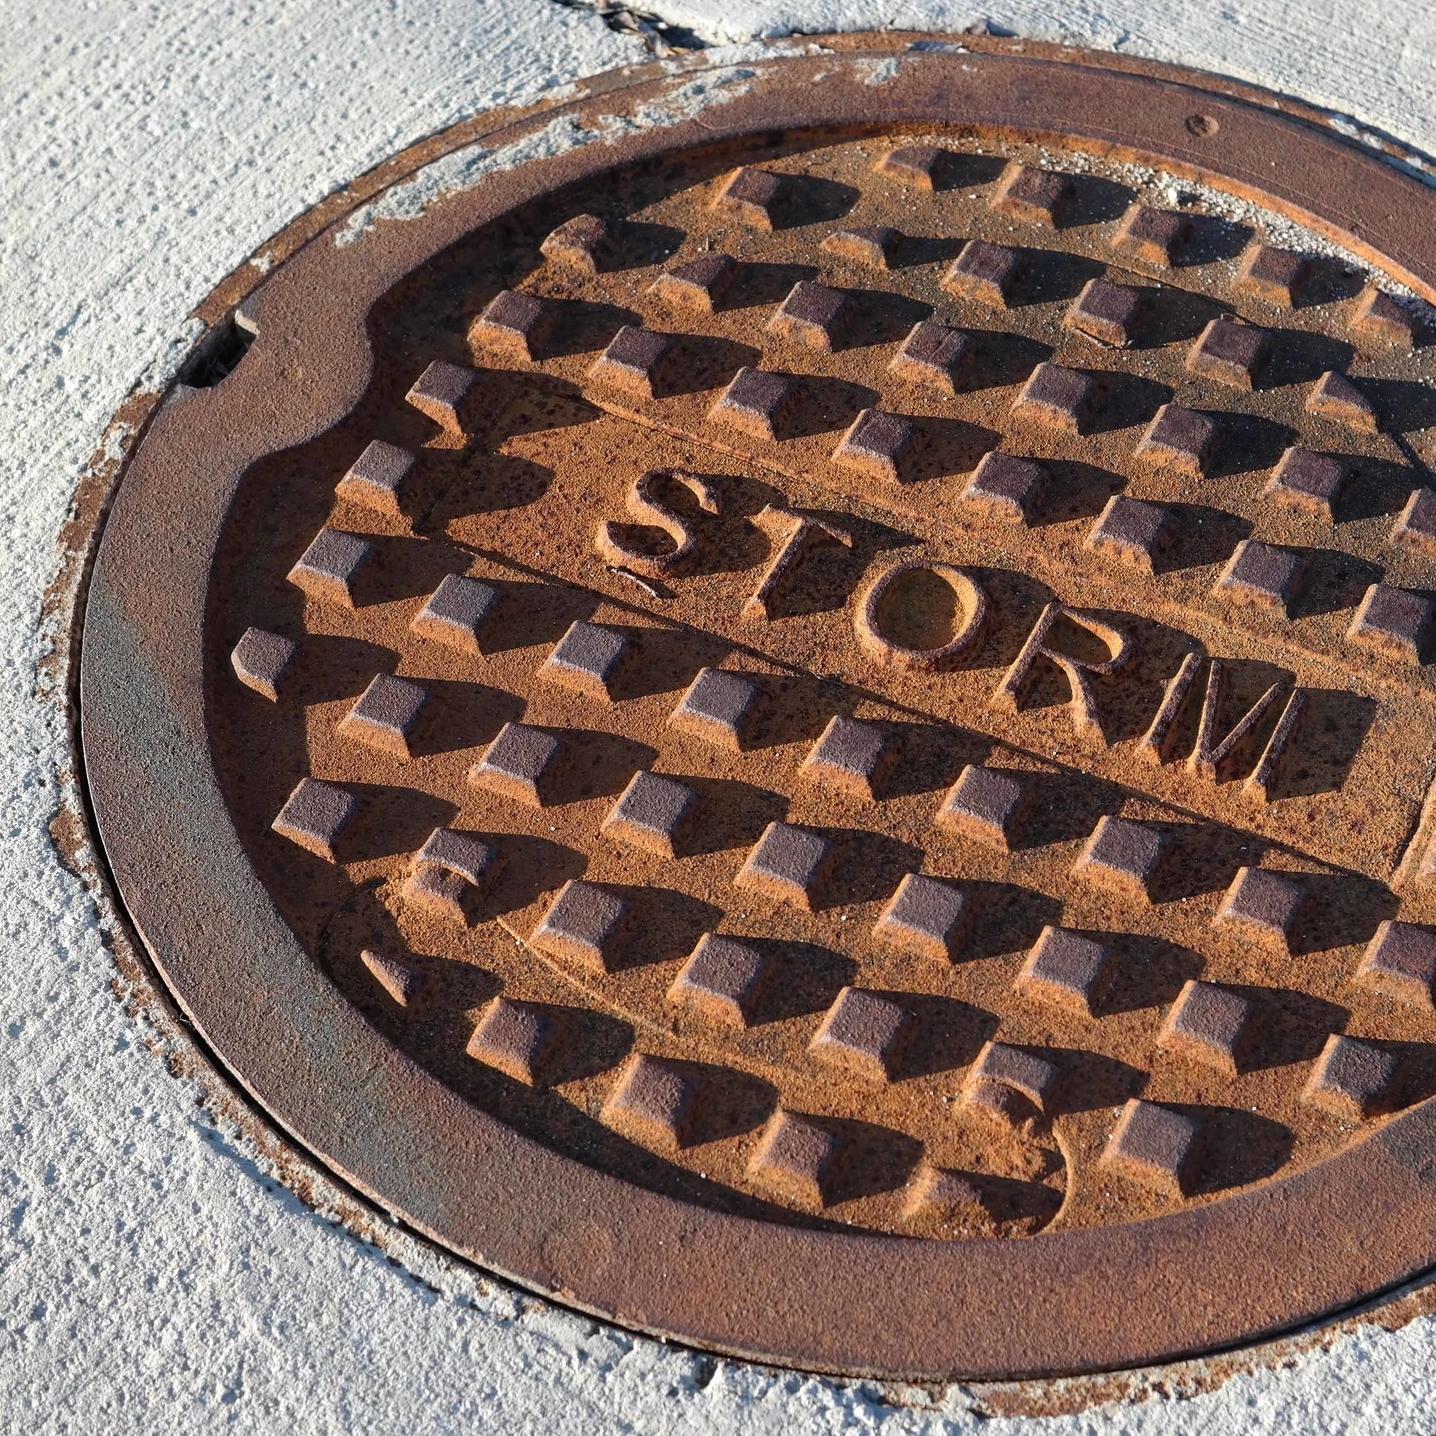 Stormwater Manhole